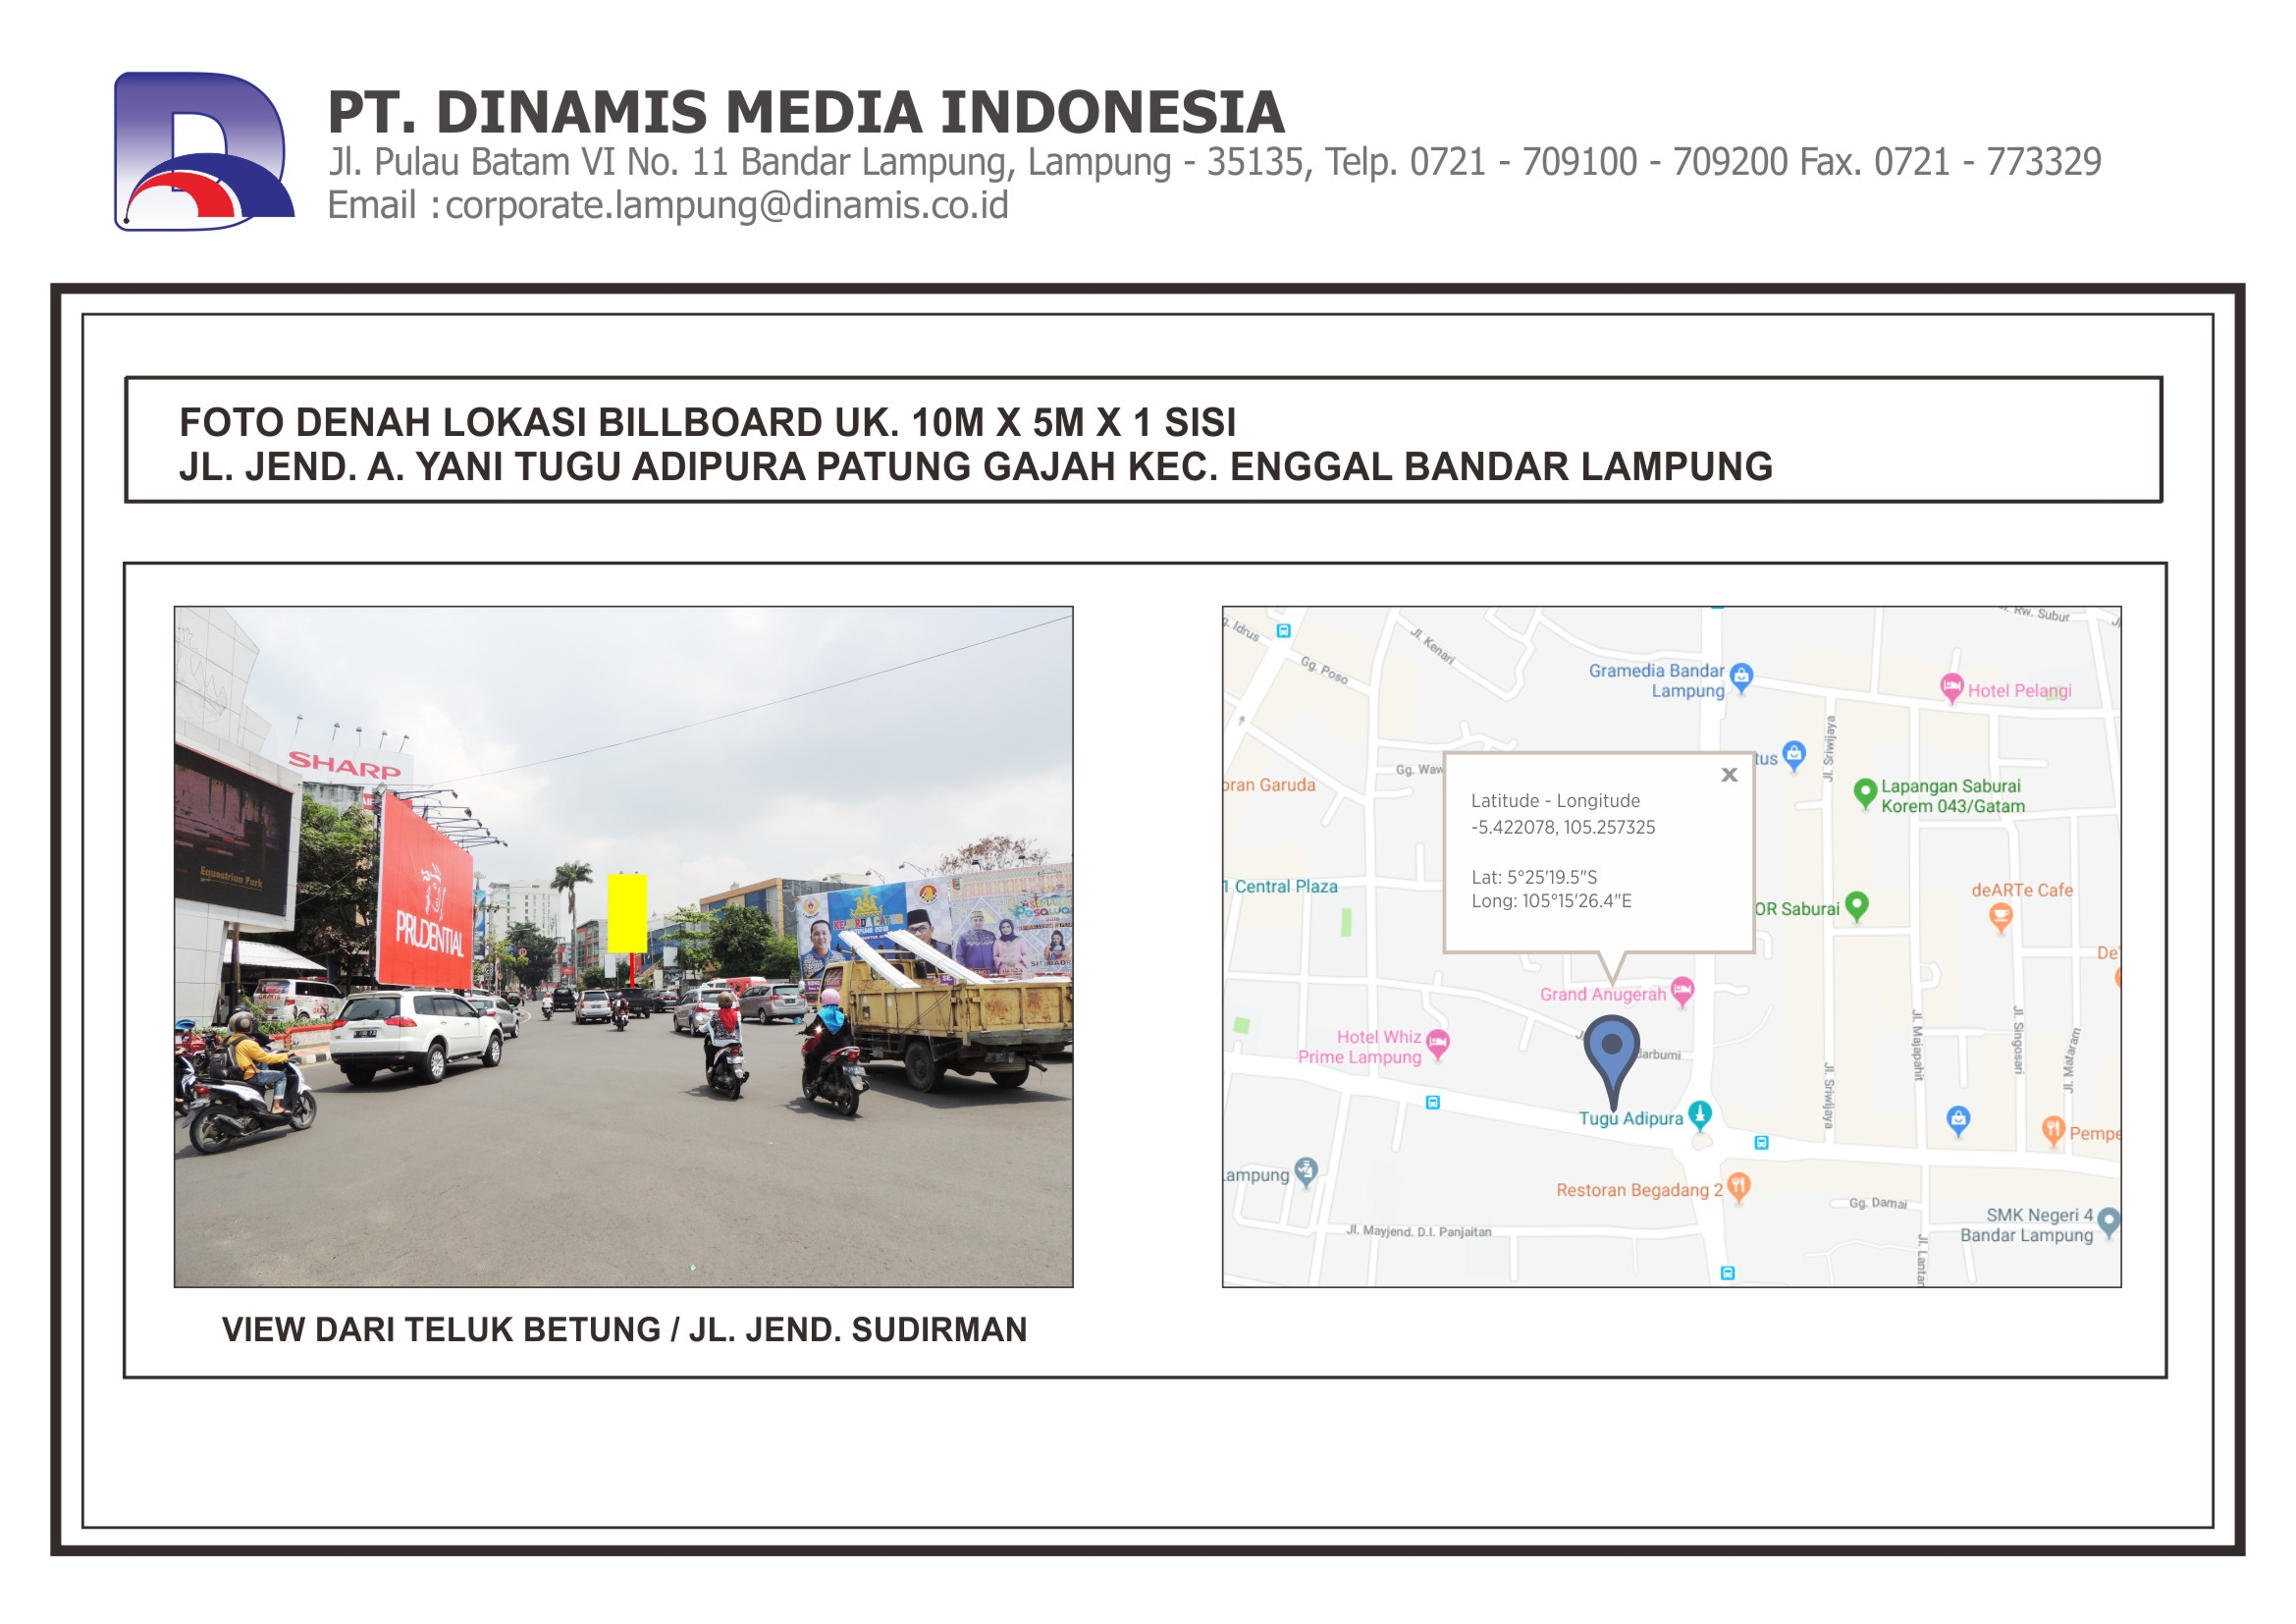 FDL BB 10mx5m - Jl. Ahmad Yani - Bundaran Tugu Adipura - Patung Gajah